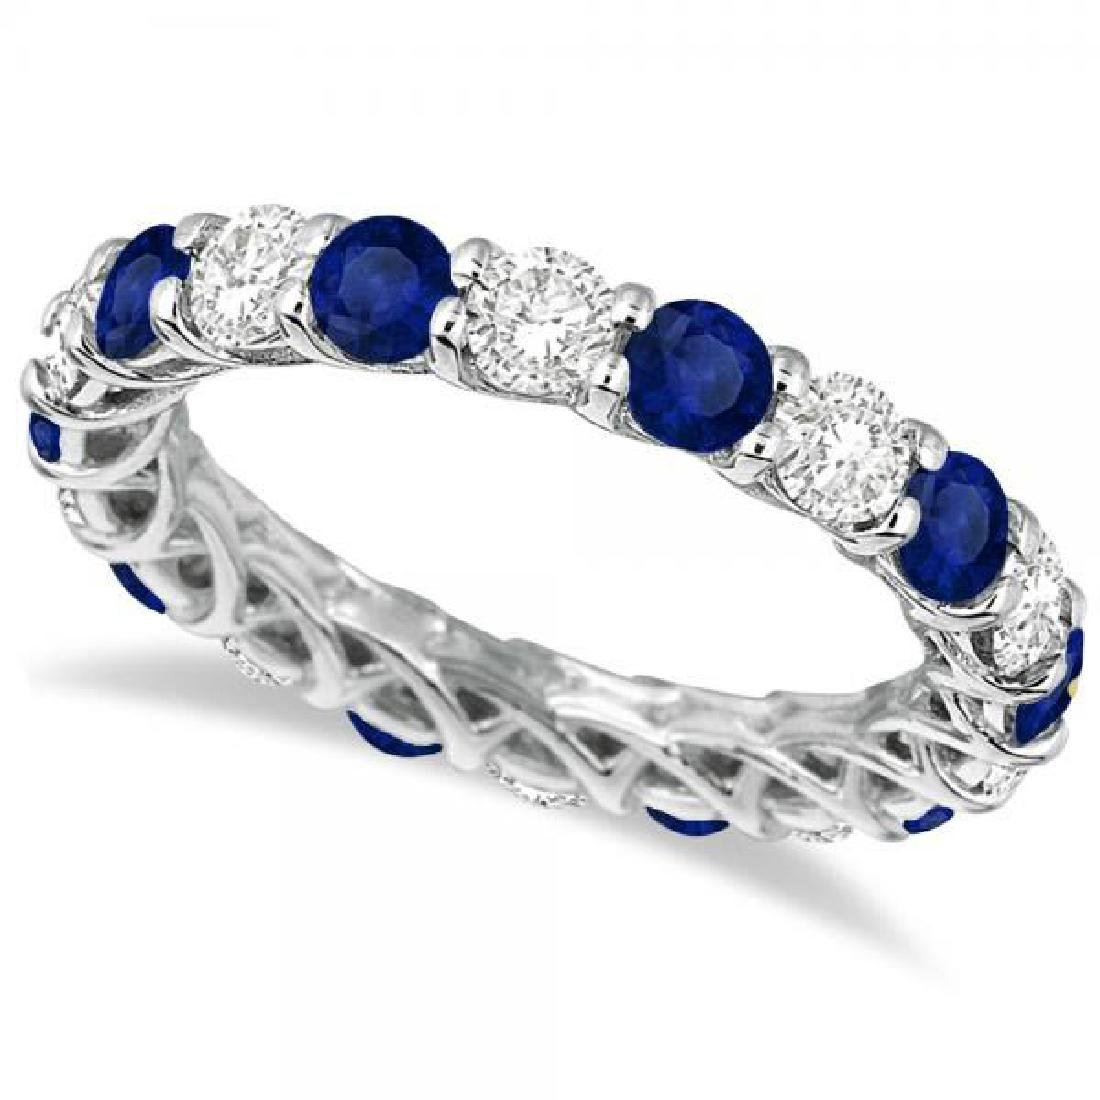 Luxury Diamond and Blue Sapphire Eternity Ring Band 14k